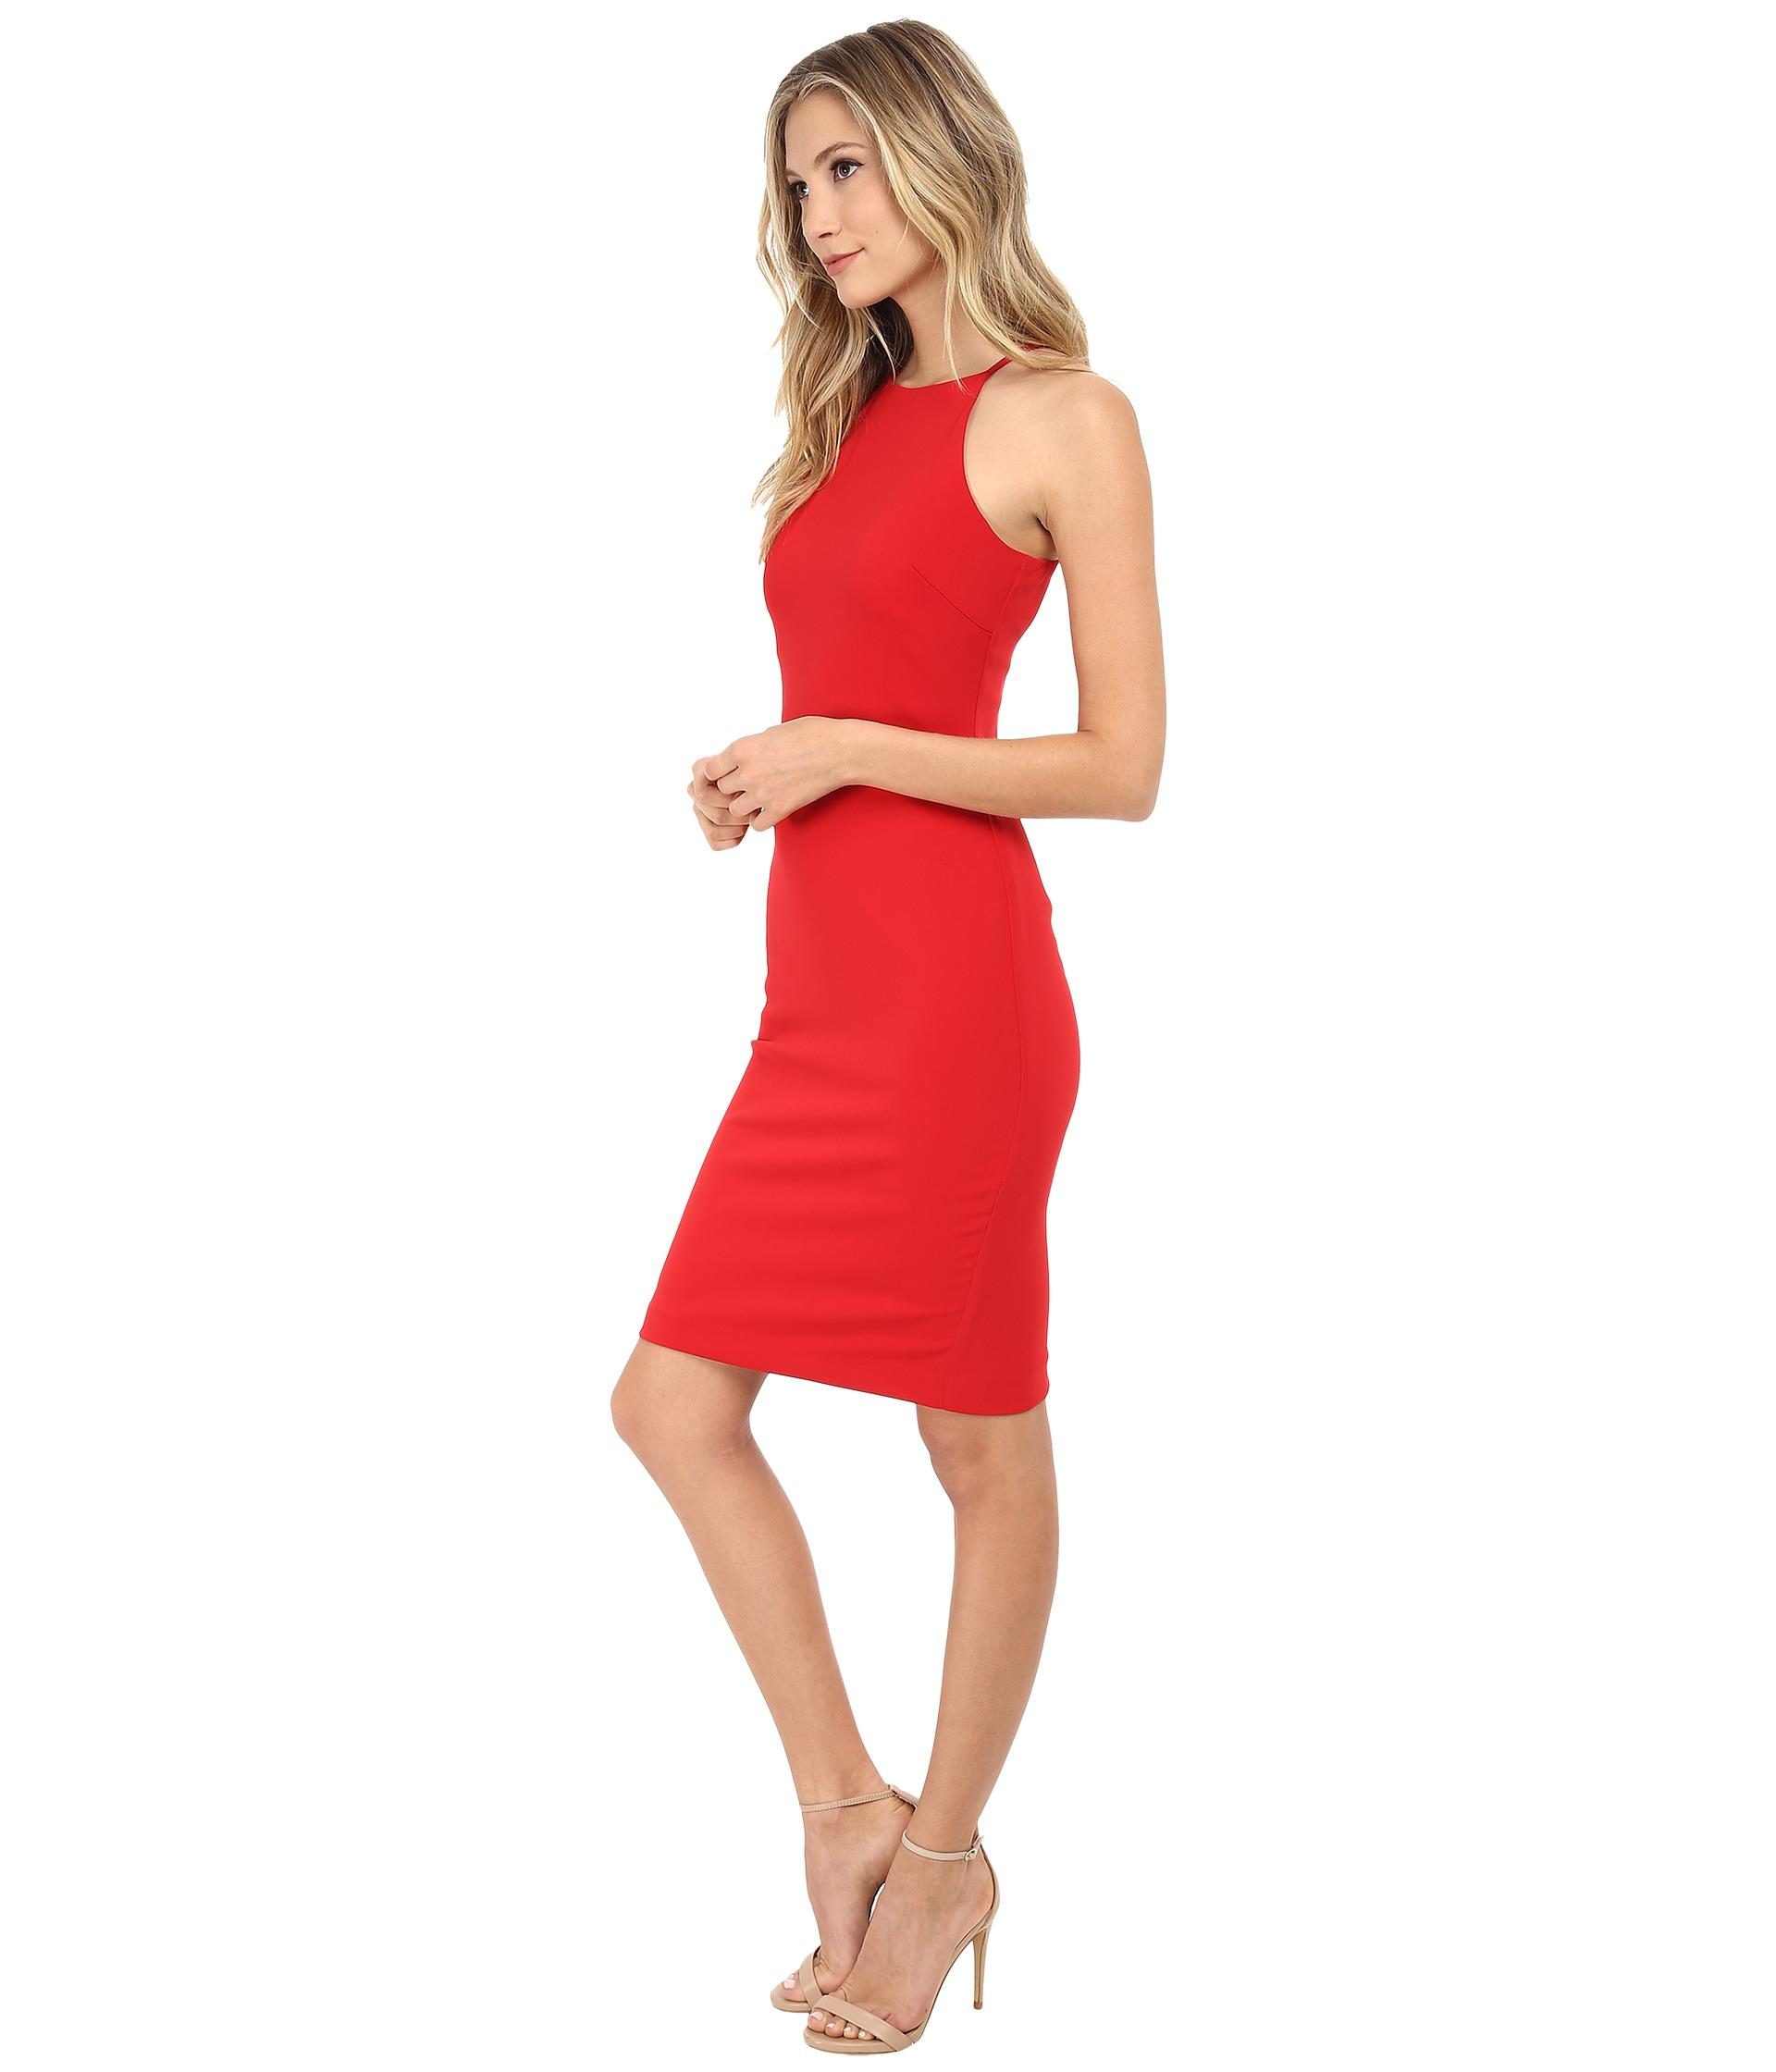 Lyst - Badgley Mischka Stretch Crepe Halter Cocktail Dress in Red